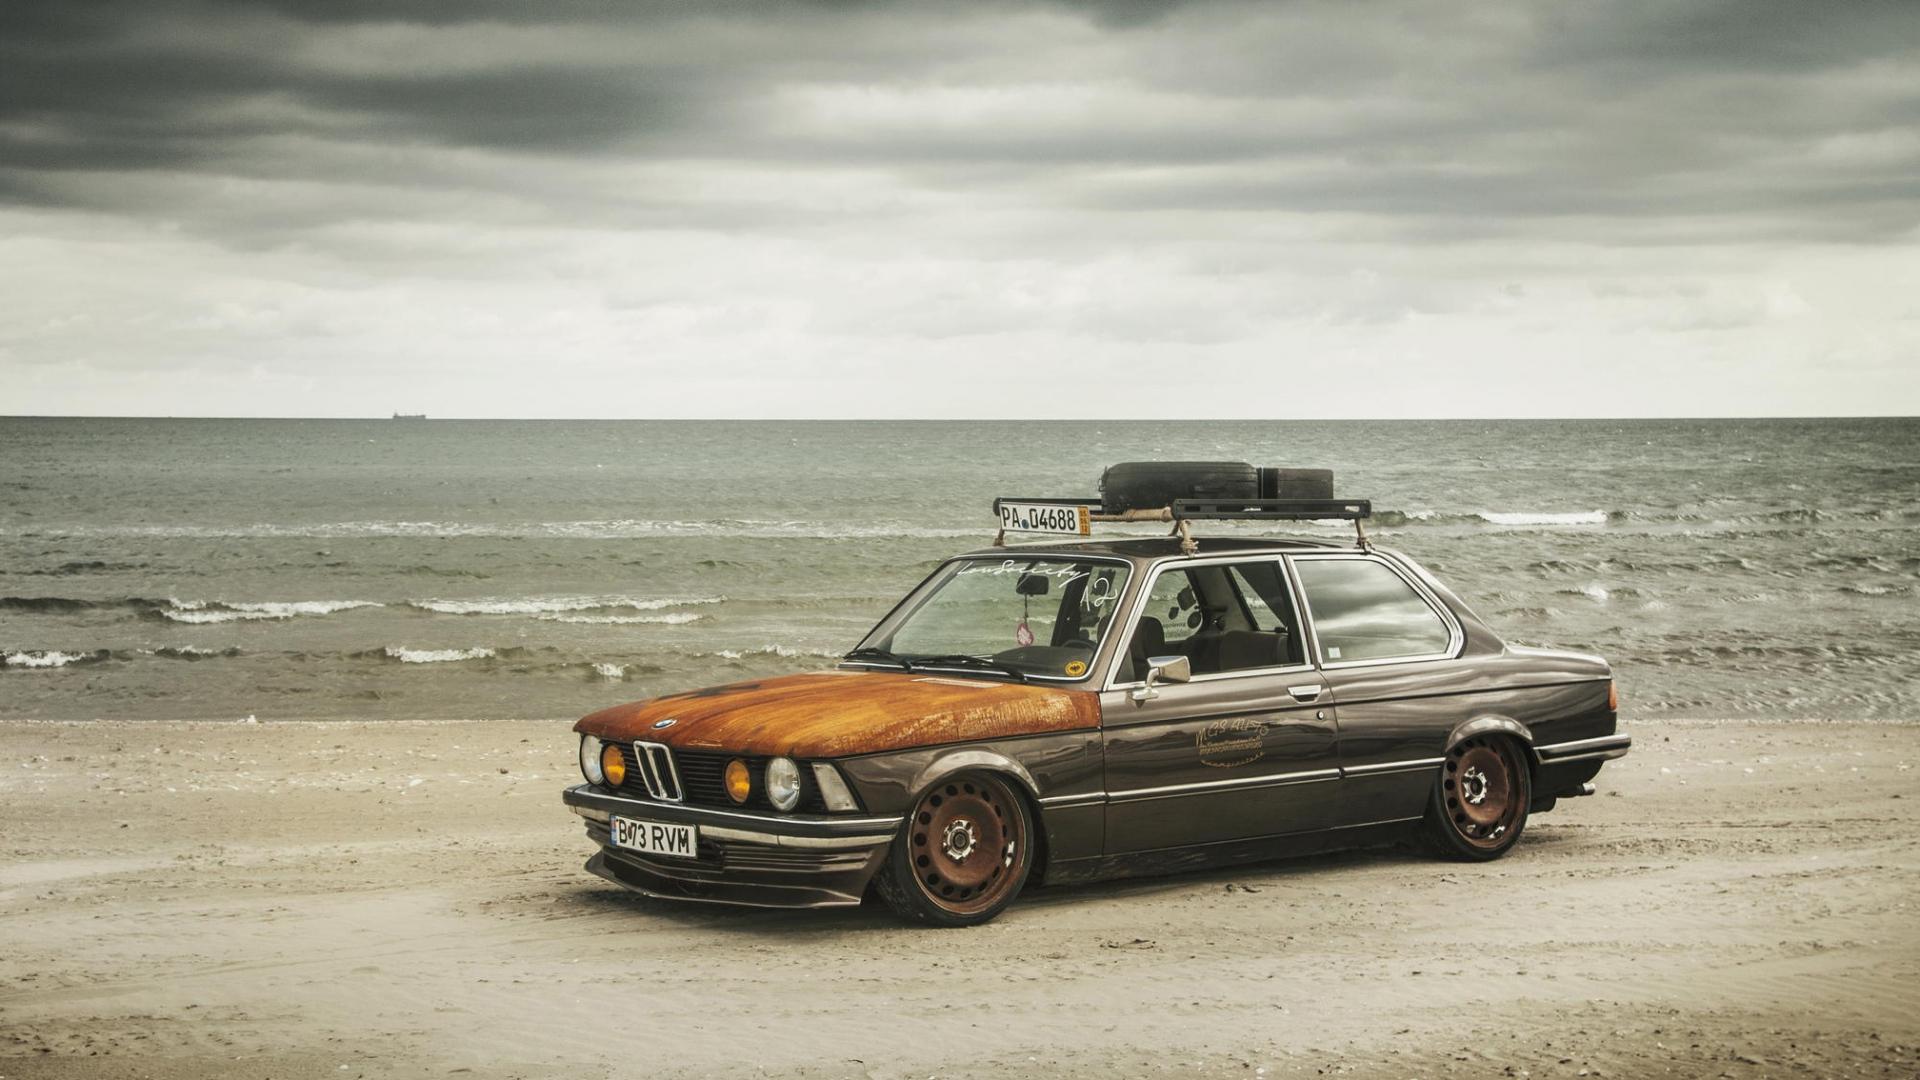 46+ BMW HD Wallpapers 1920x1080 on WallpaperSafari